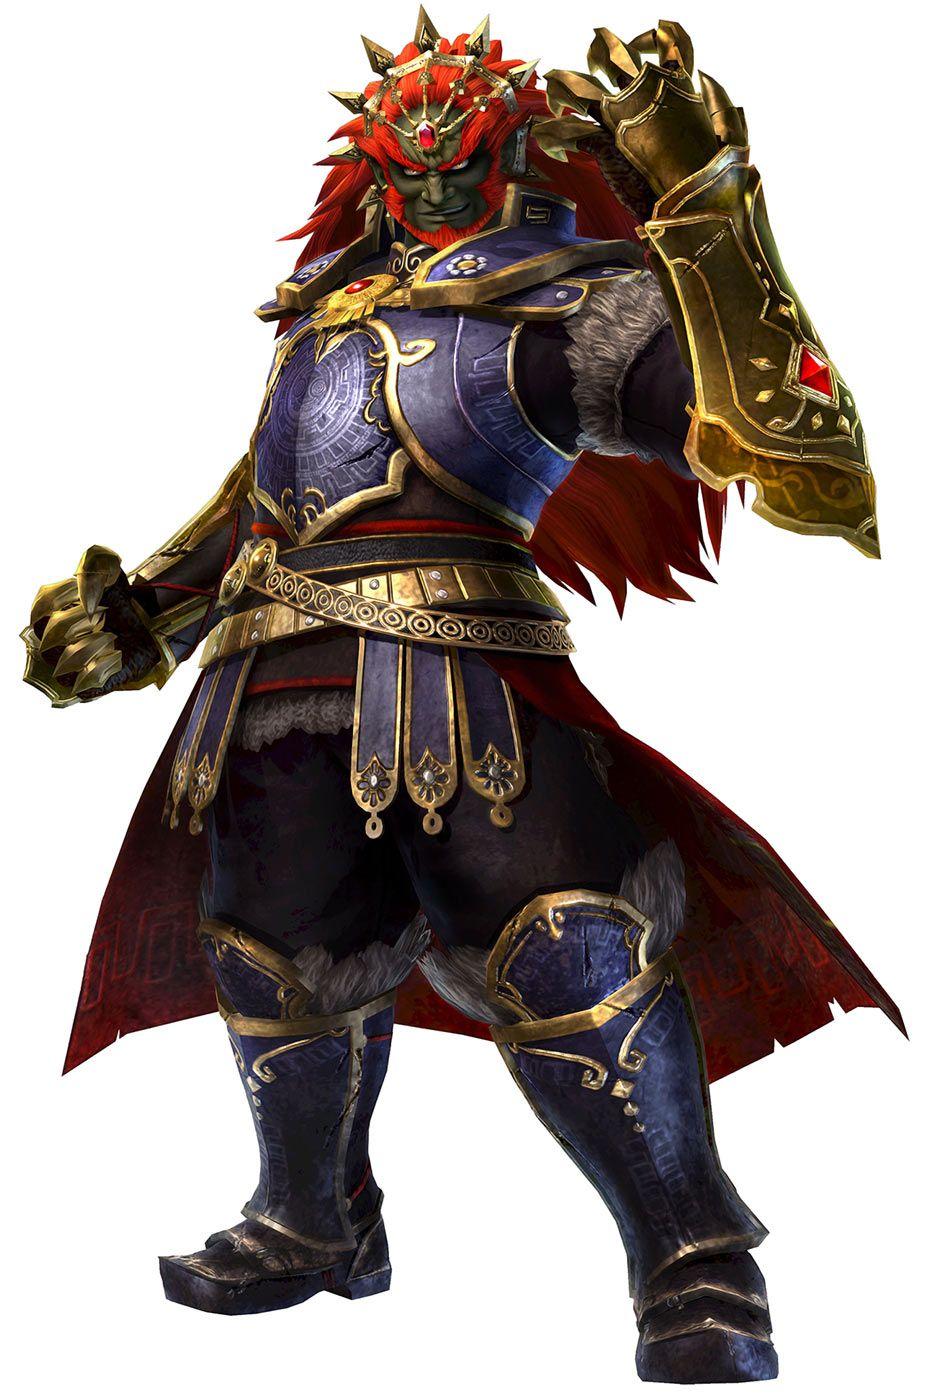 Ganon Characters & Art Hyrule Warriors Art